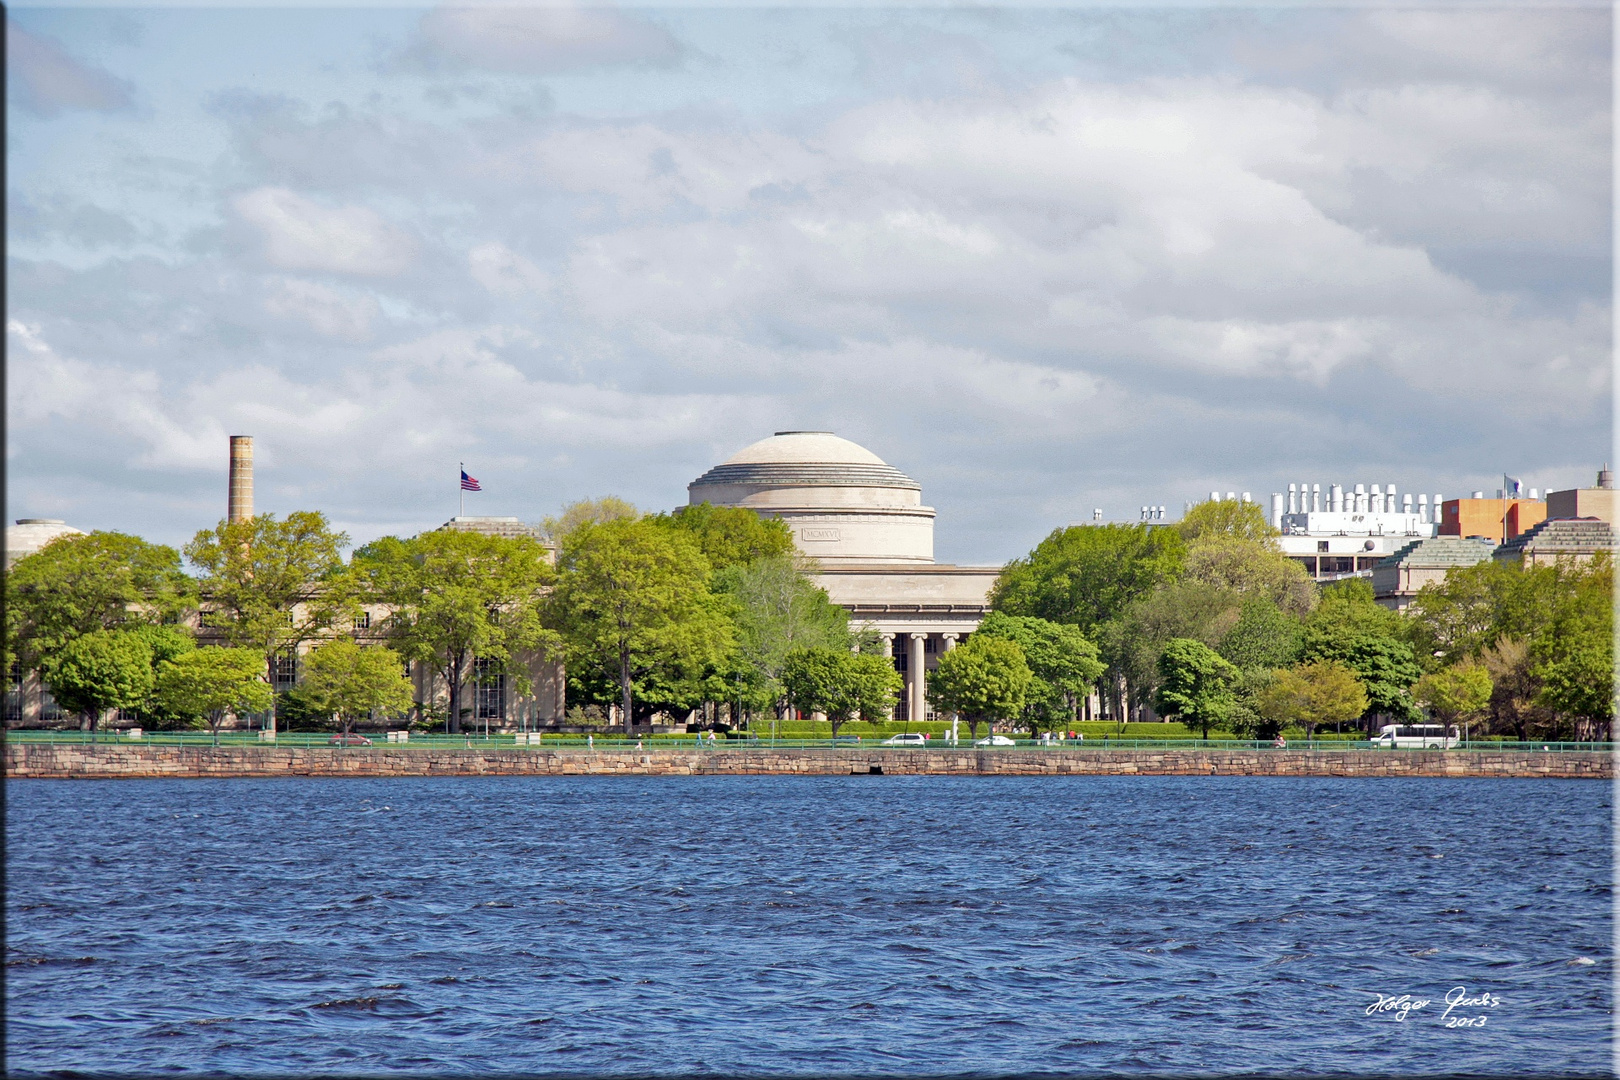 Blick über den Charles River auf den Kuppelbau des MIT